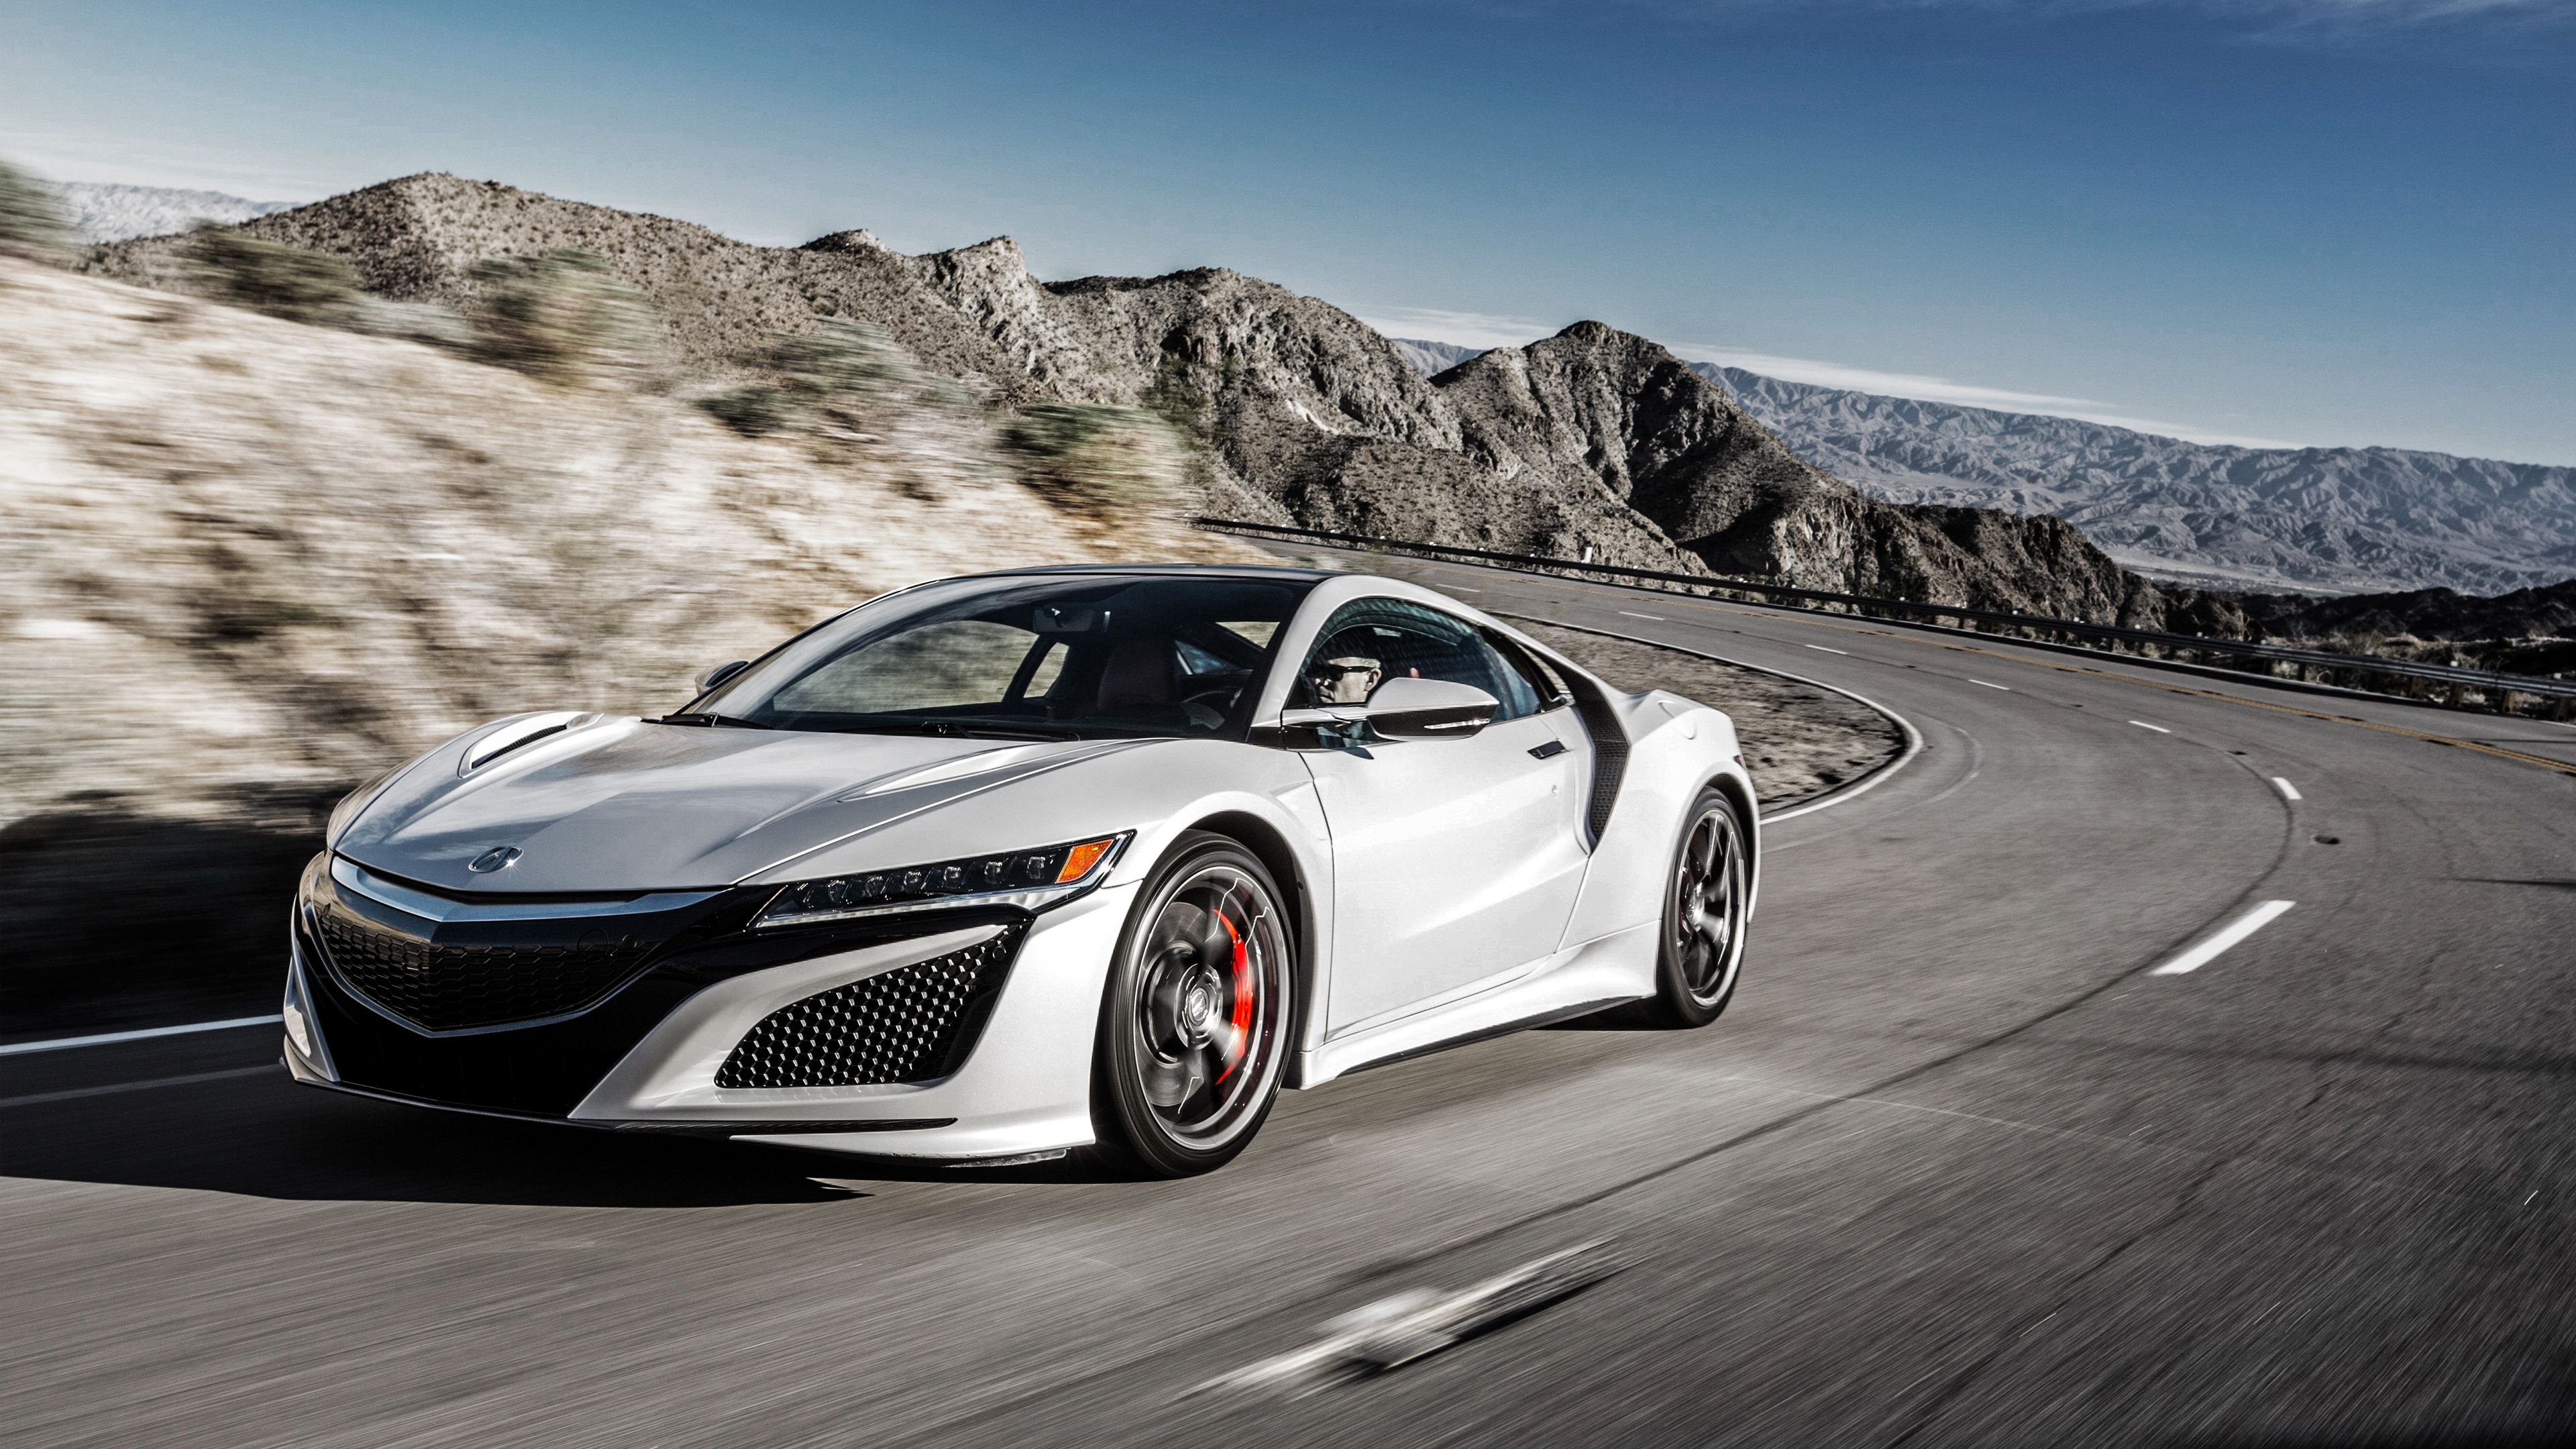 Sport Cars 4K Wallpapers - Top Free Sport Cars 4K ...